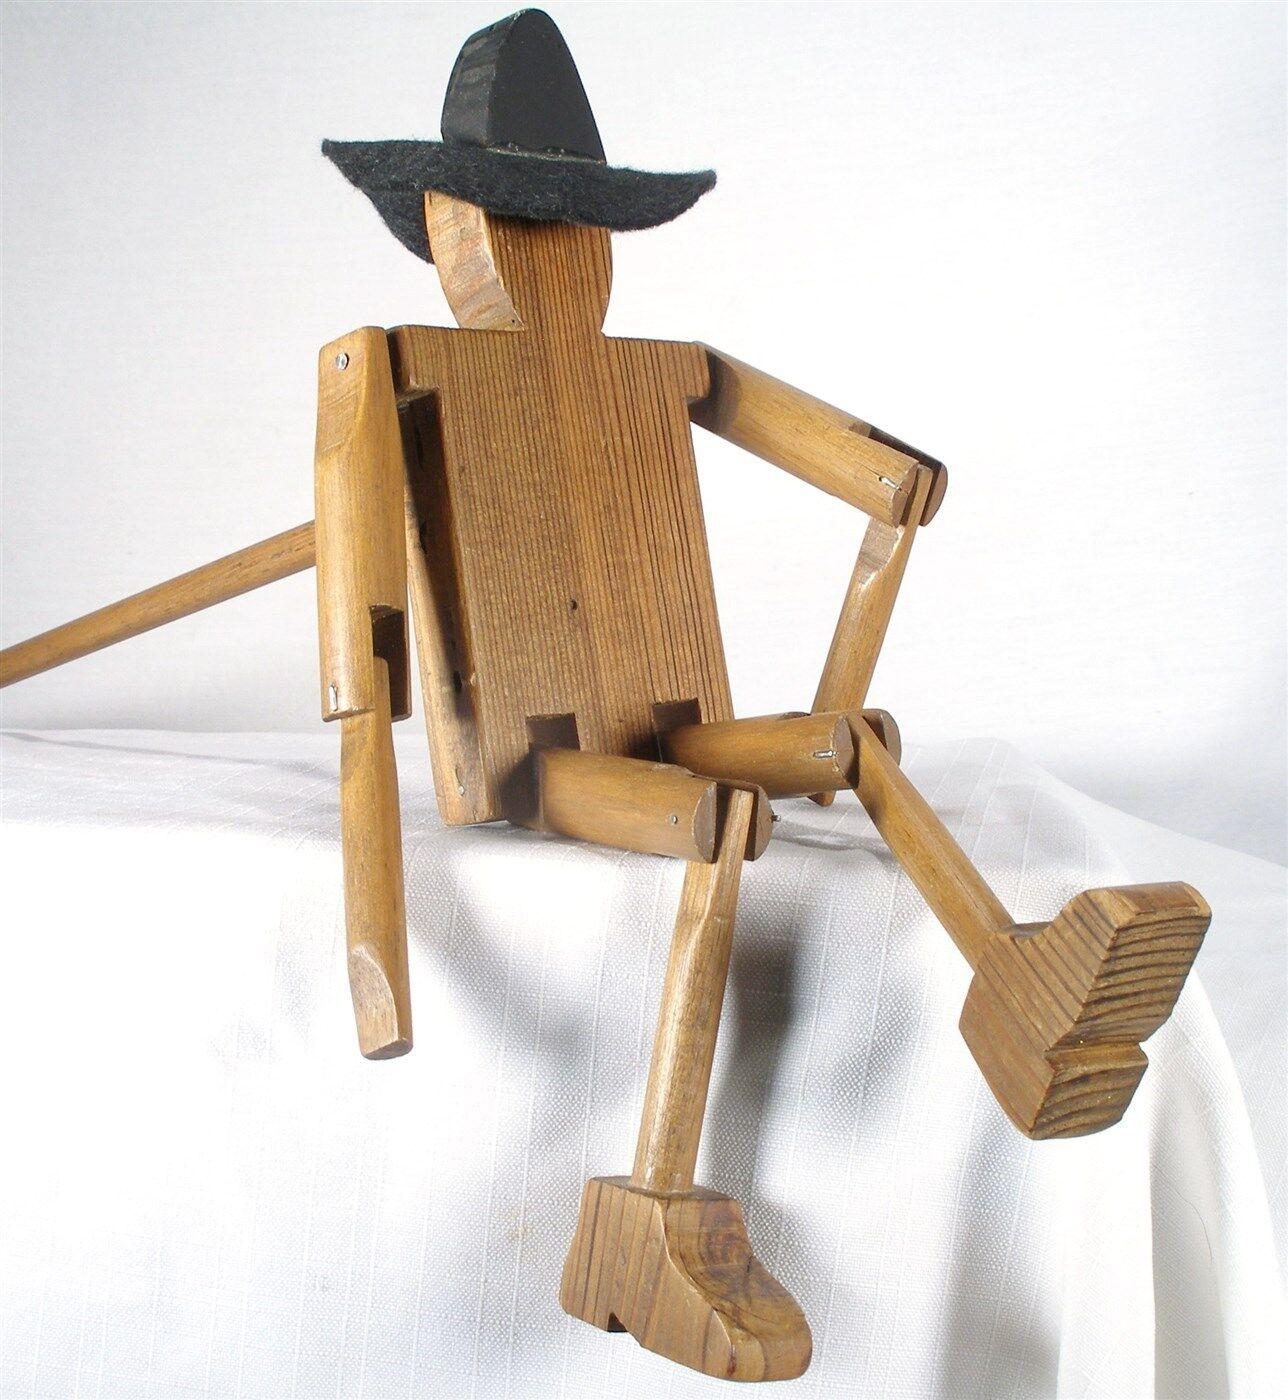 Antiguo Arte Popular Muñeca de madera de vaquero palo limberjack Jig mano artista intérprete o ejecutante Marioneta